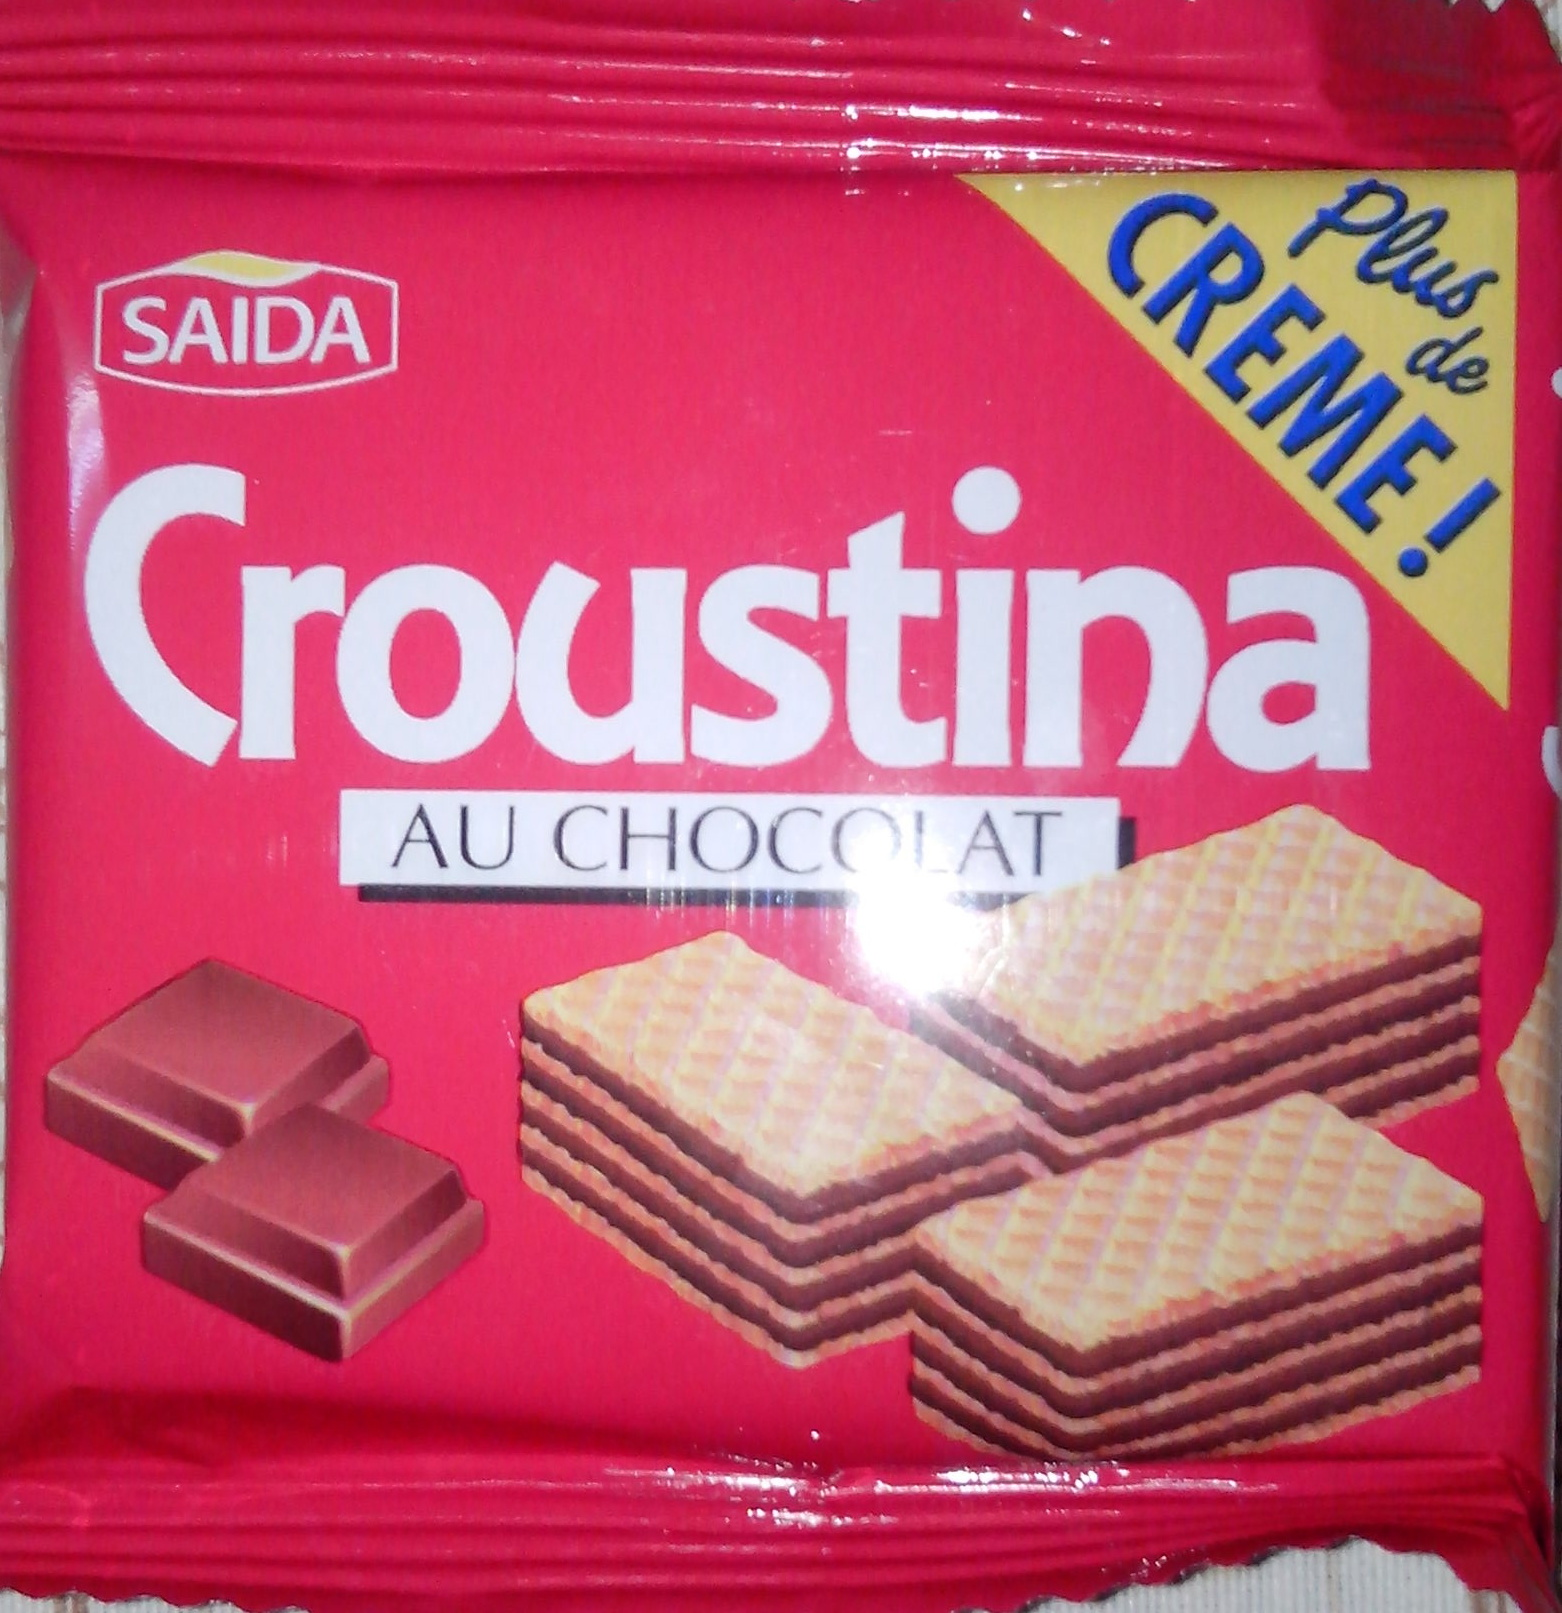 Croustina au Chocolat - نتاج - fr